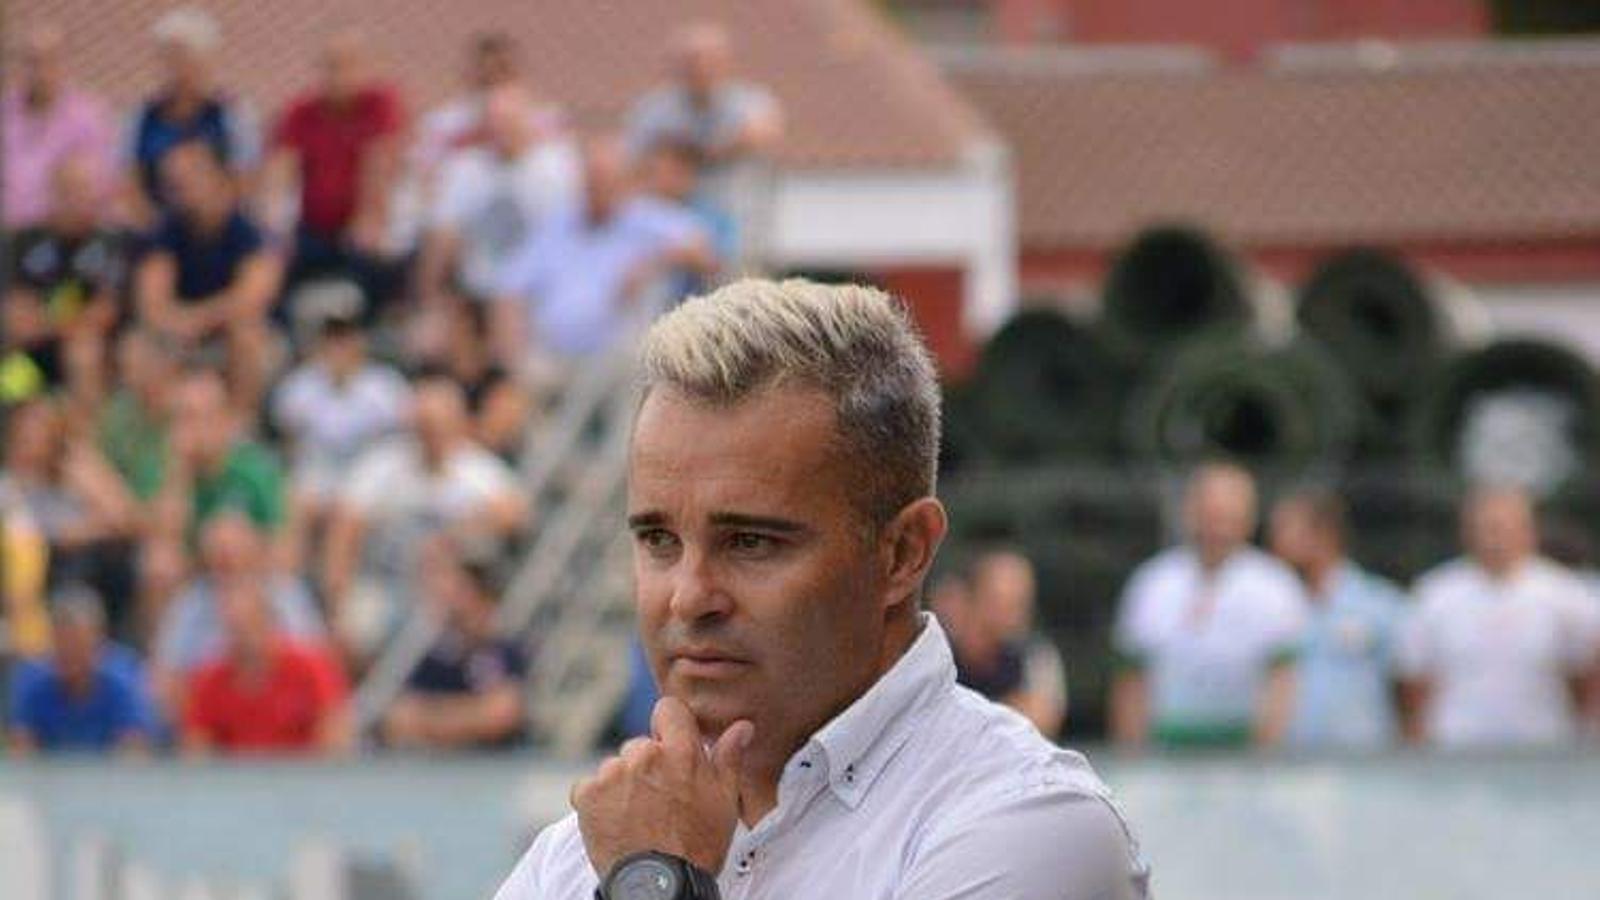 Juan Arsenal Moreno, nou entrenador de la SD Formentera